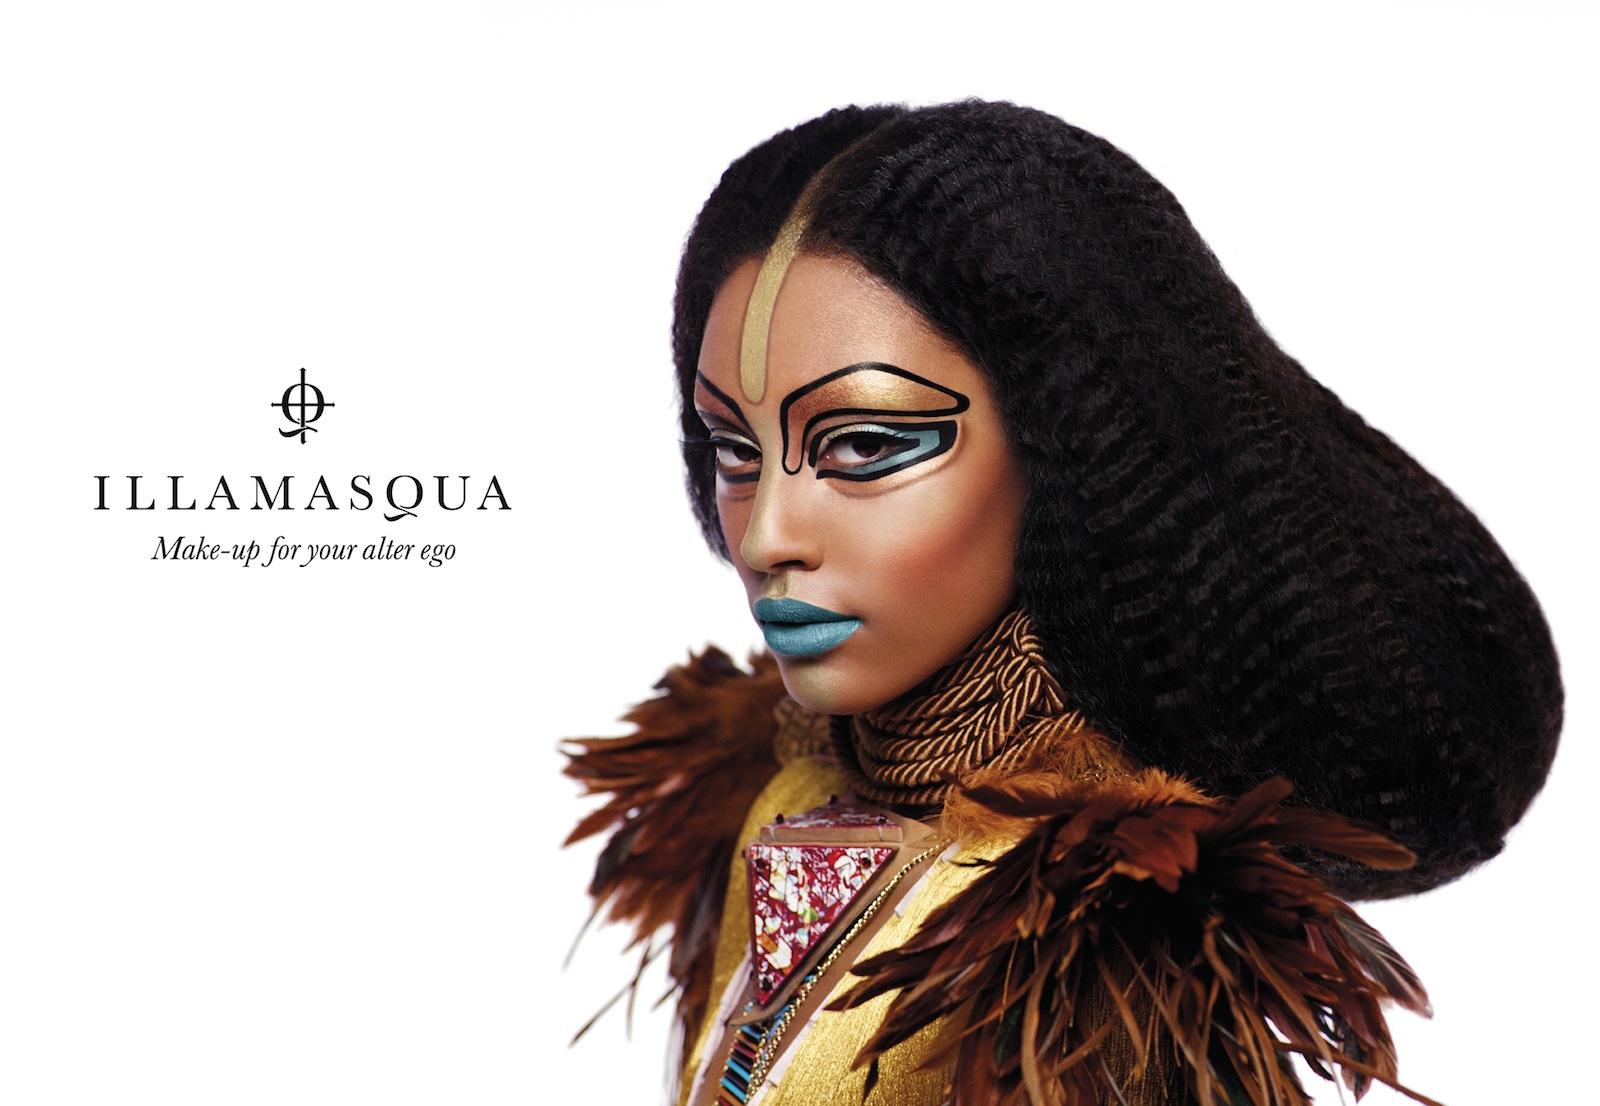 Illamasqua beyond powder omg my review bonnie garner skincare ss12egyptian girl headlr baditri Image collections